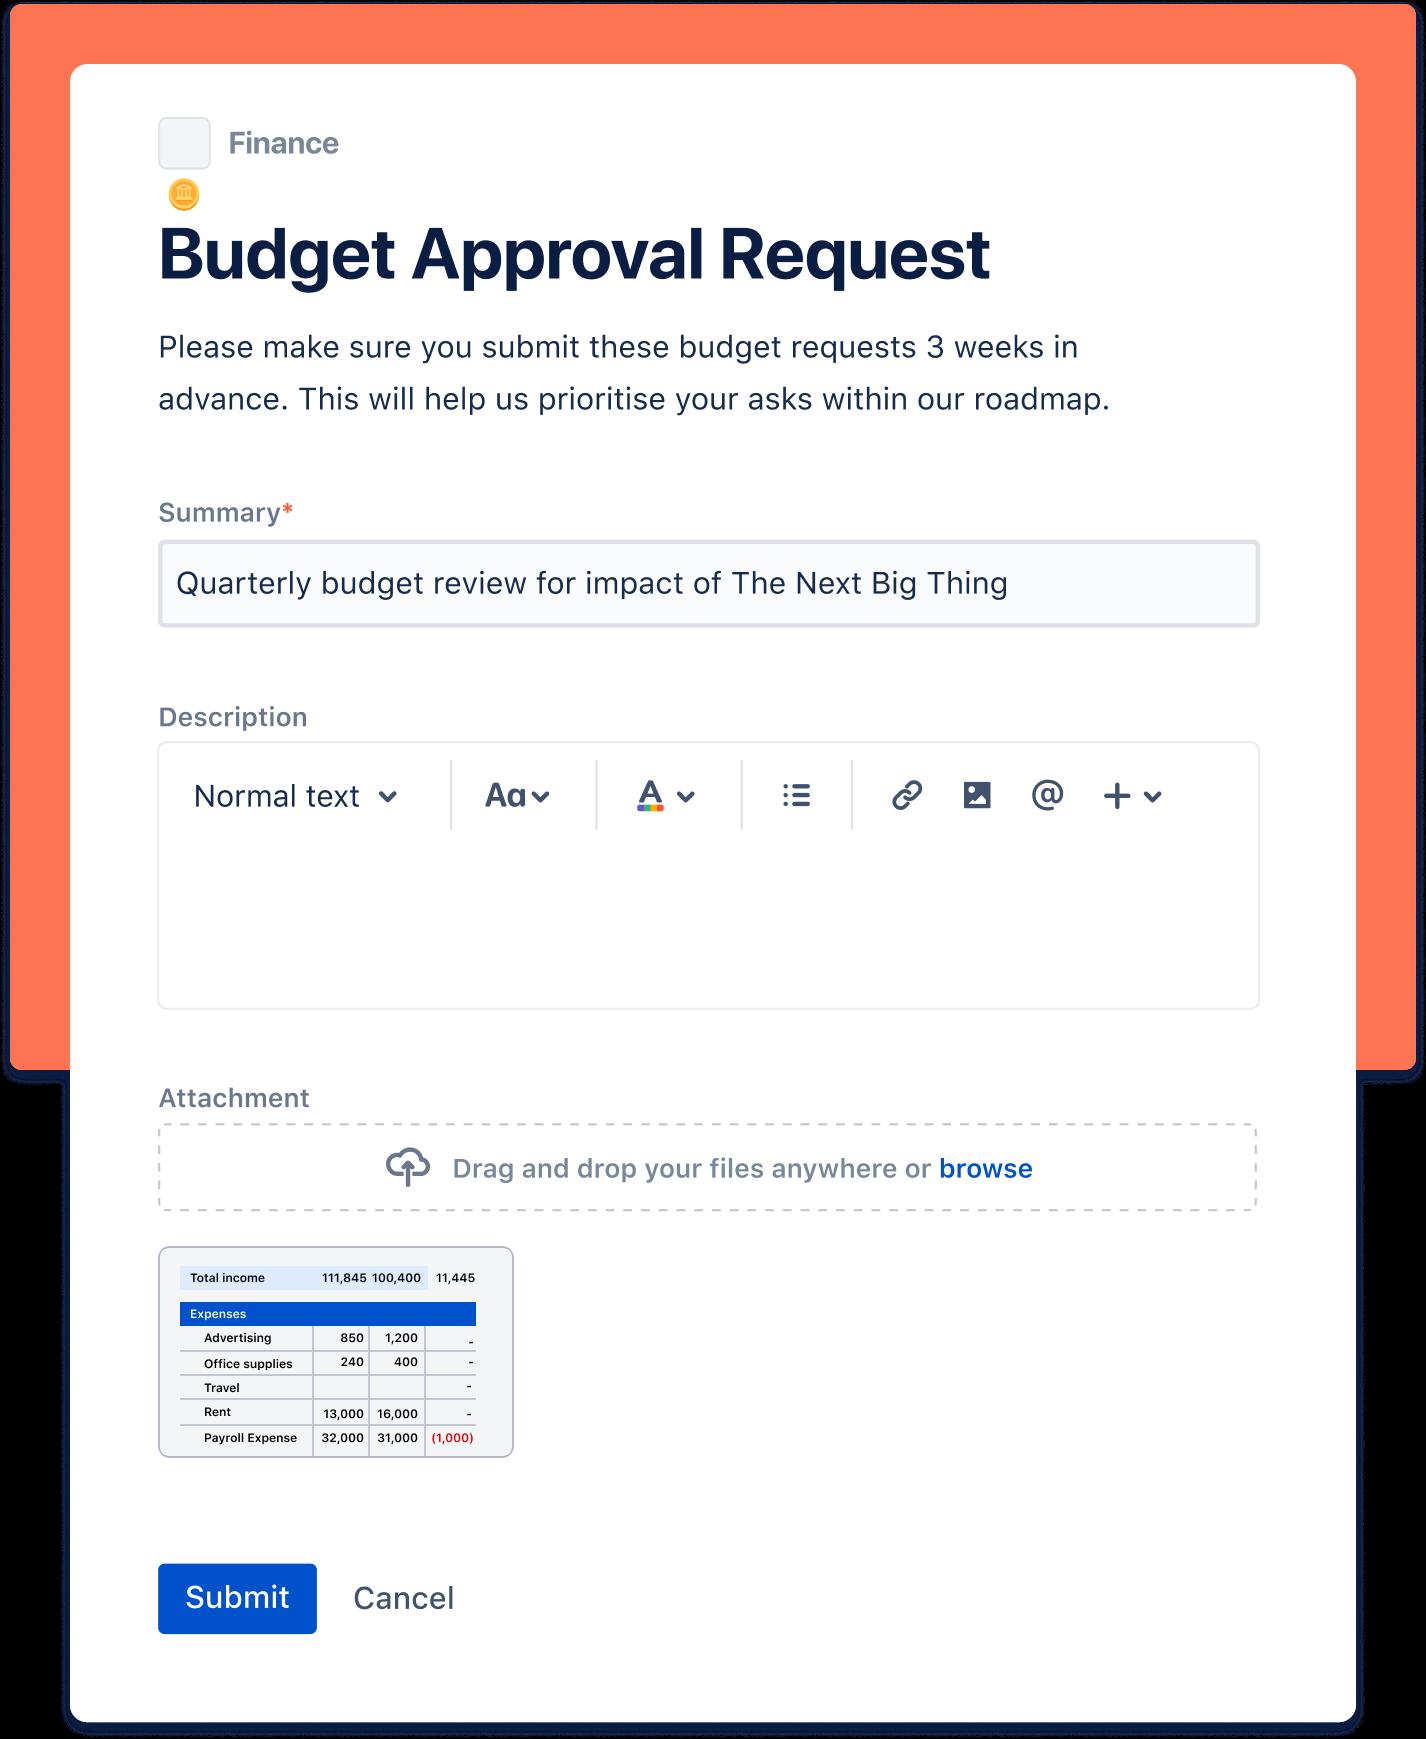 Budget approval request screenshot